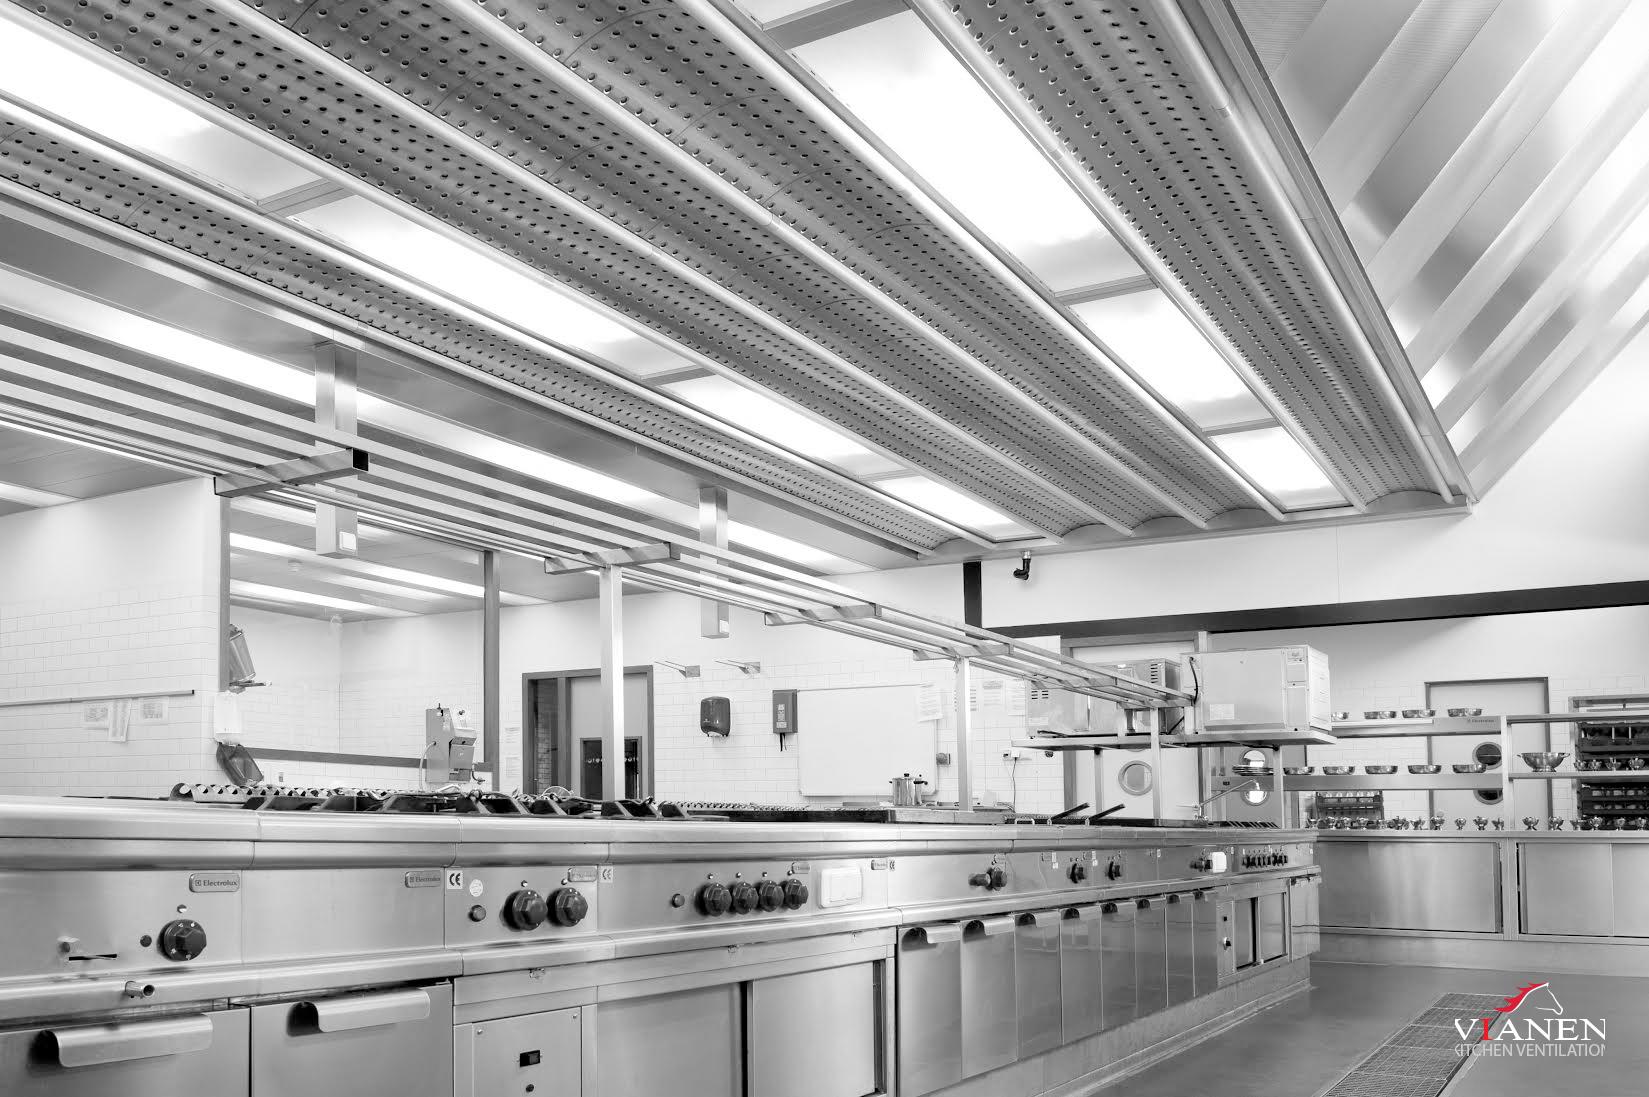 remodel ventilators best mesmerizing ideas kitchen small ventilation